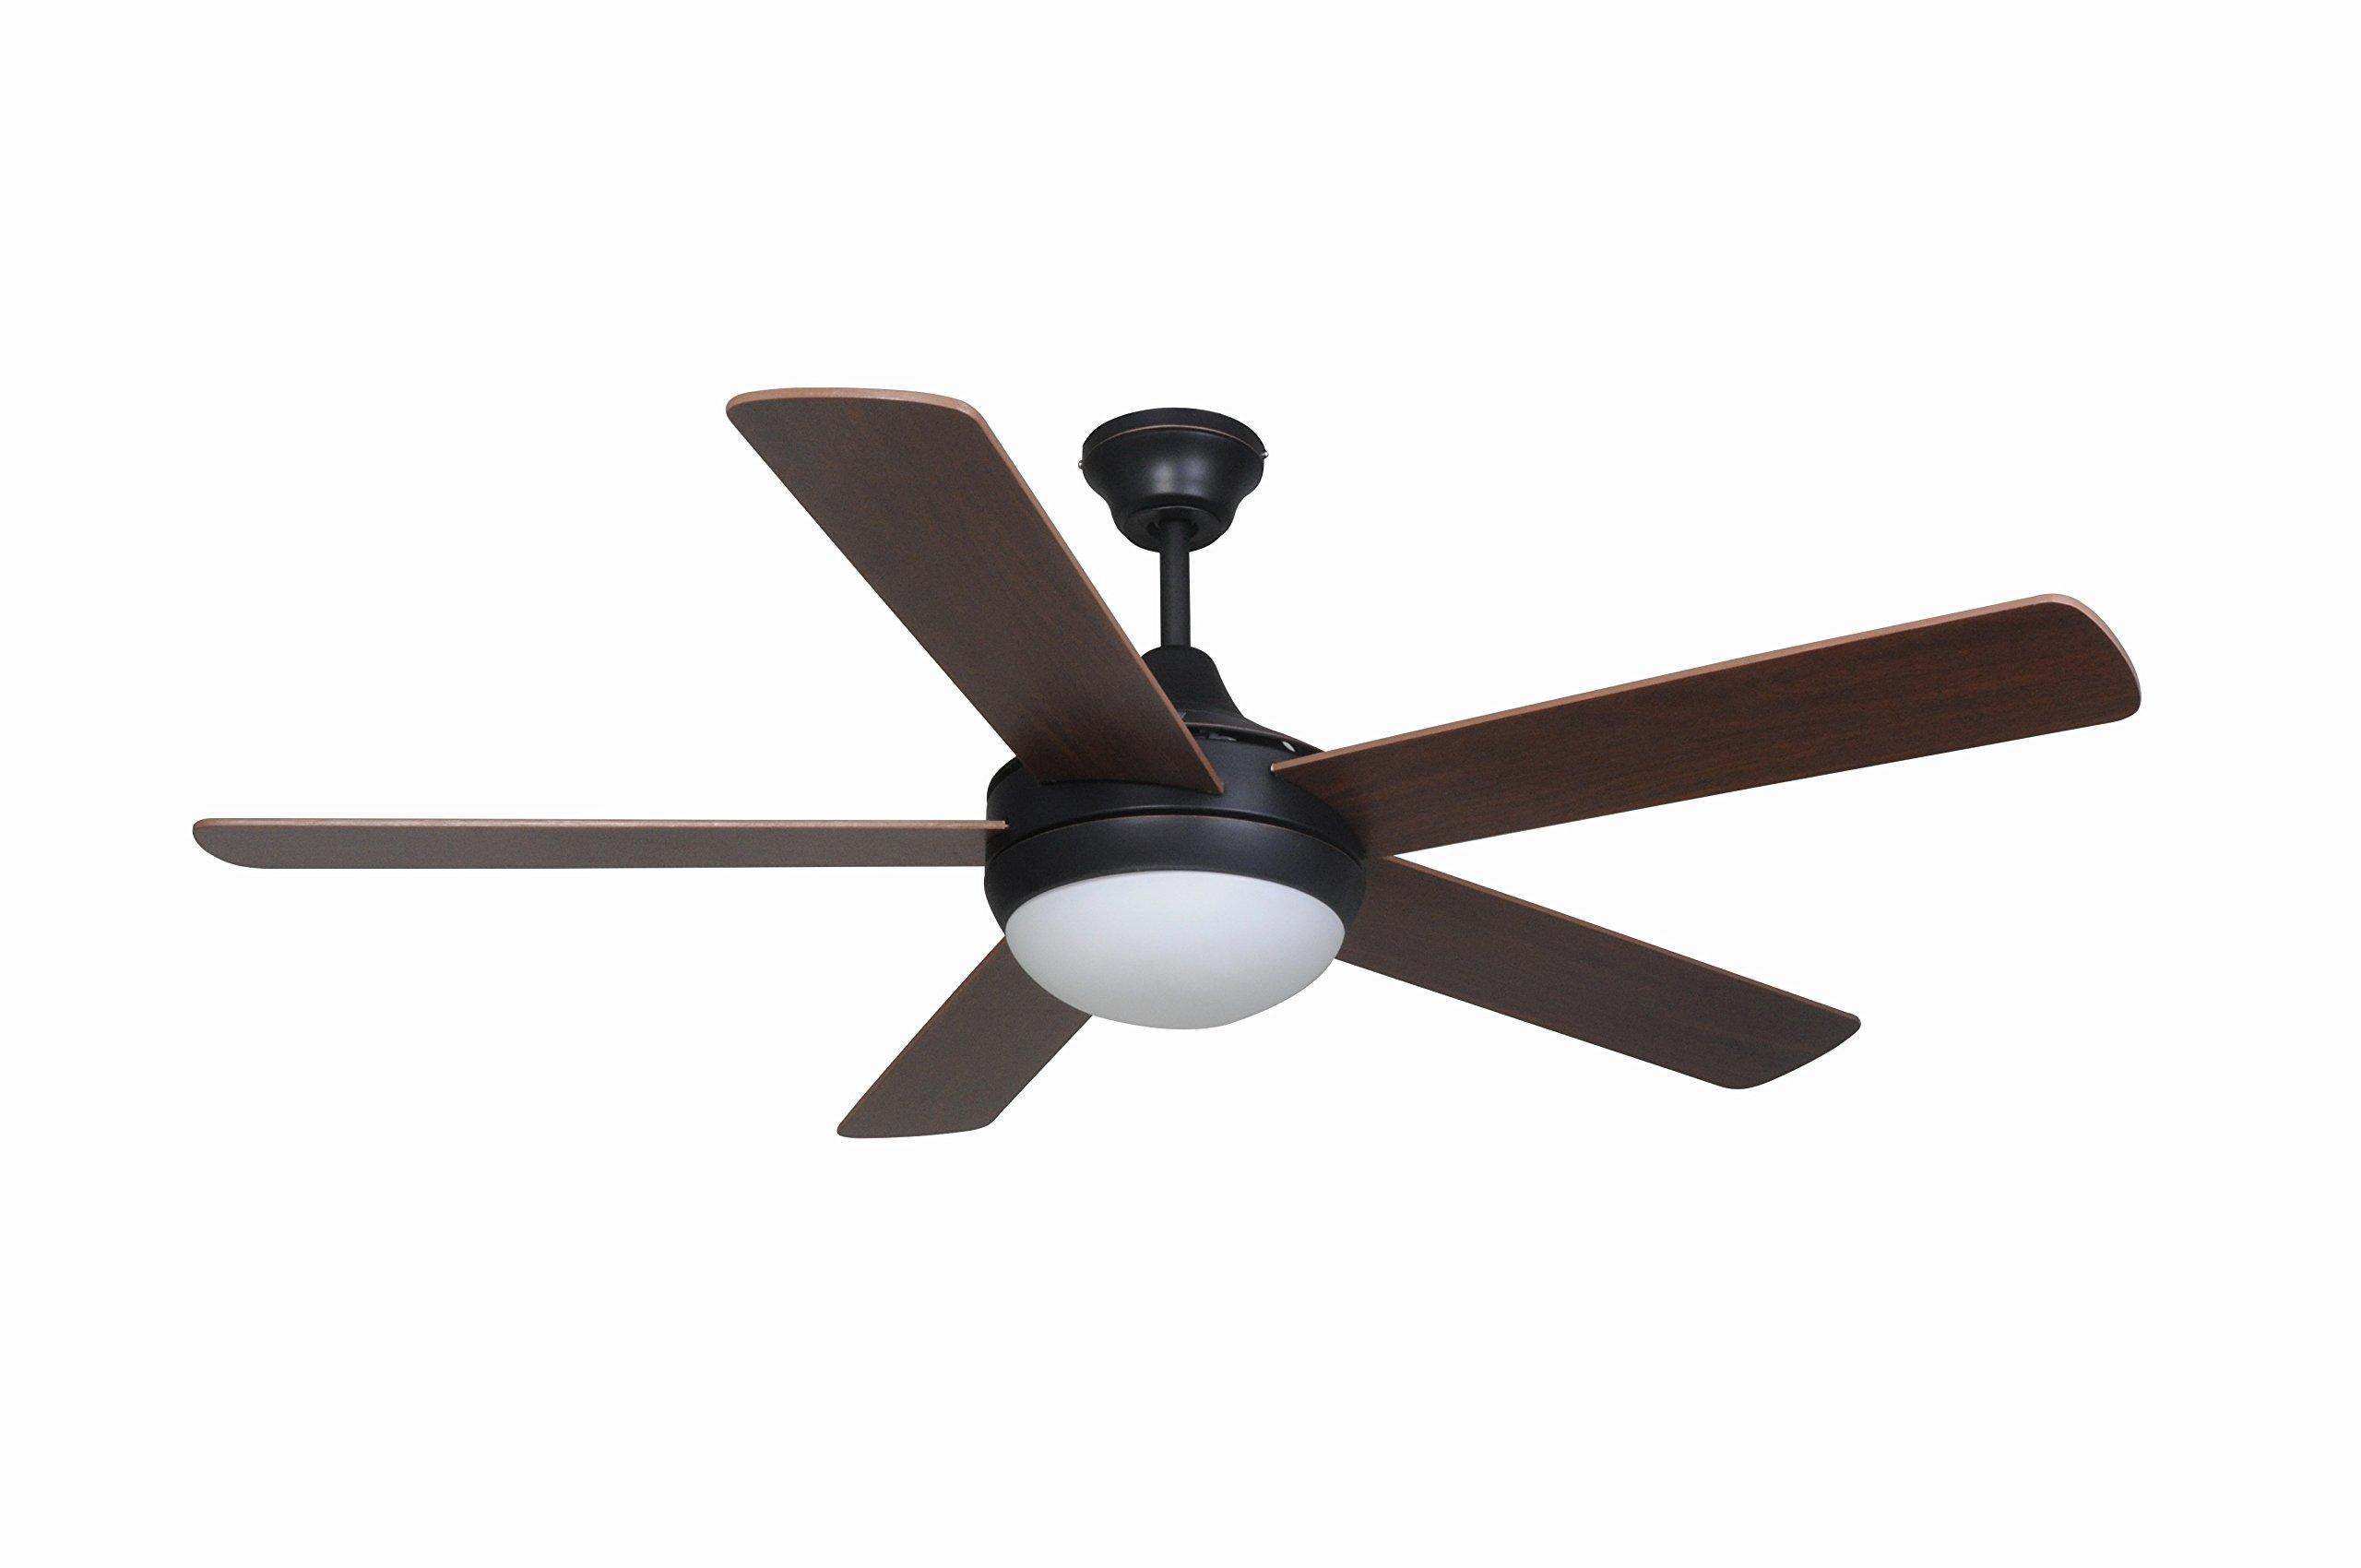 Hardware House 207249 Ceiling Fan, Oil Rubbed Bronze finish